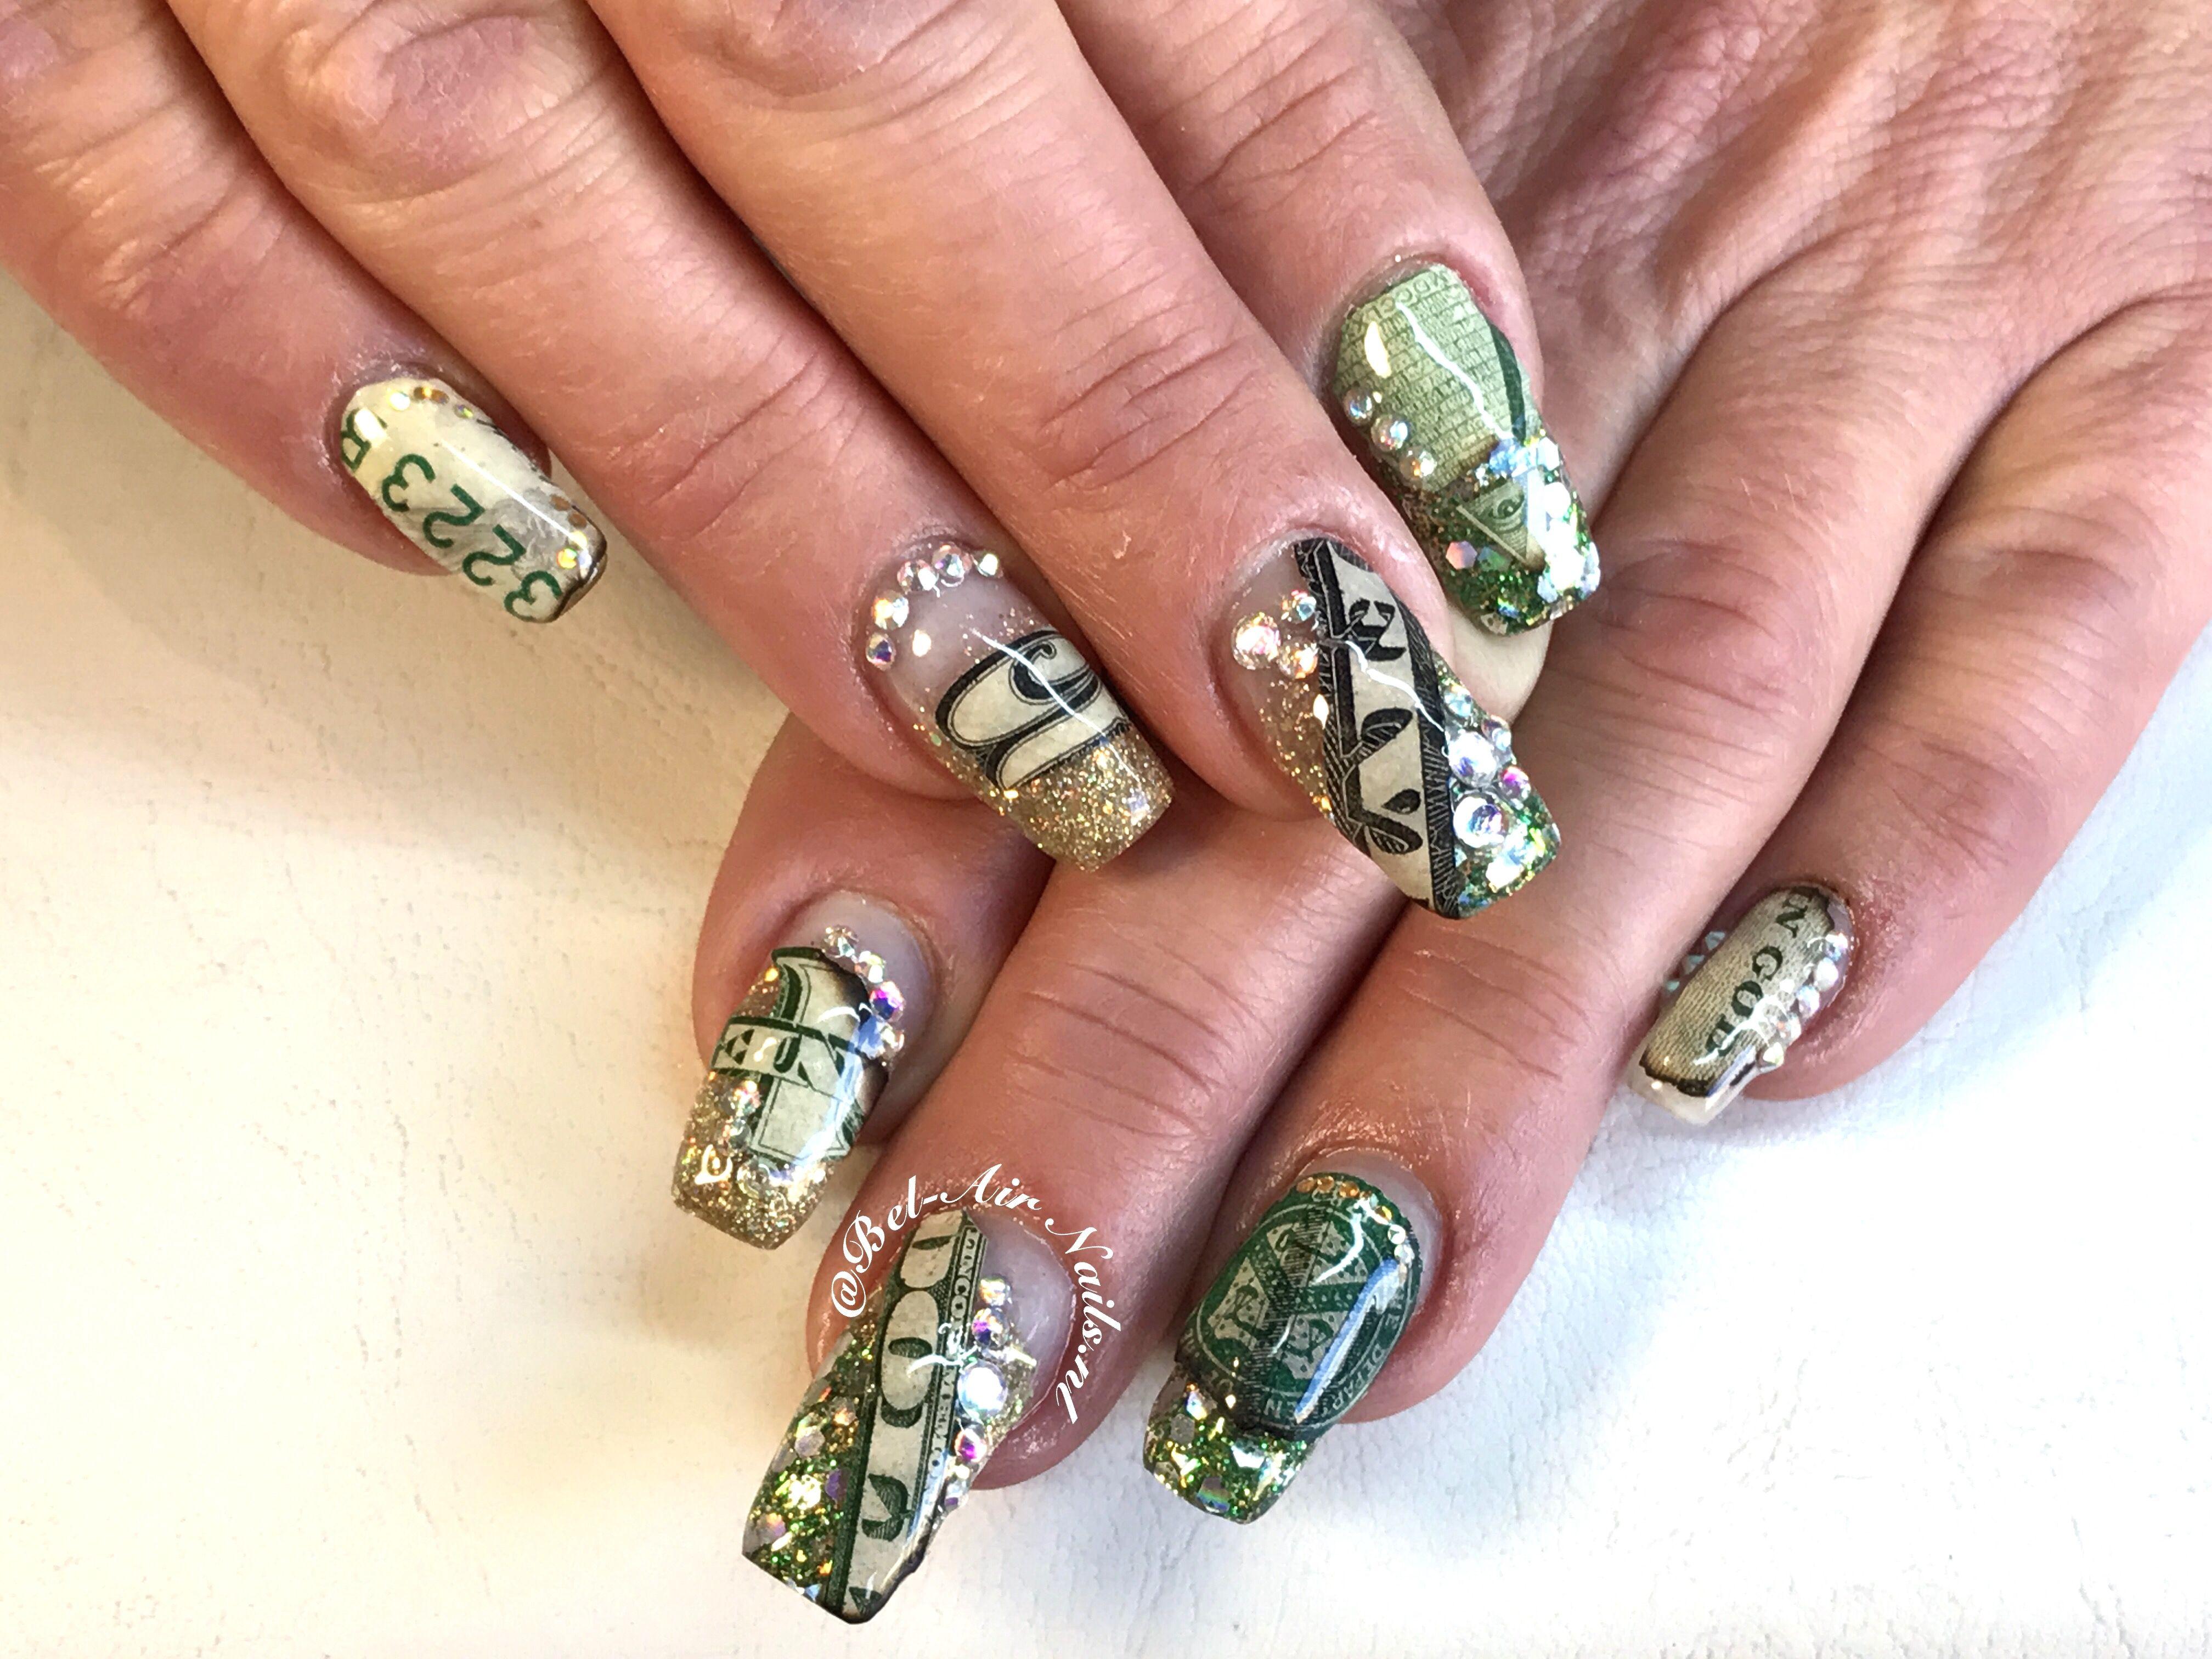 Money Nails 1 And 5 Dollar Bel Air Nails The Netherlands Http Www Instagram Com Belairnails Nails Nail Art Bel Air